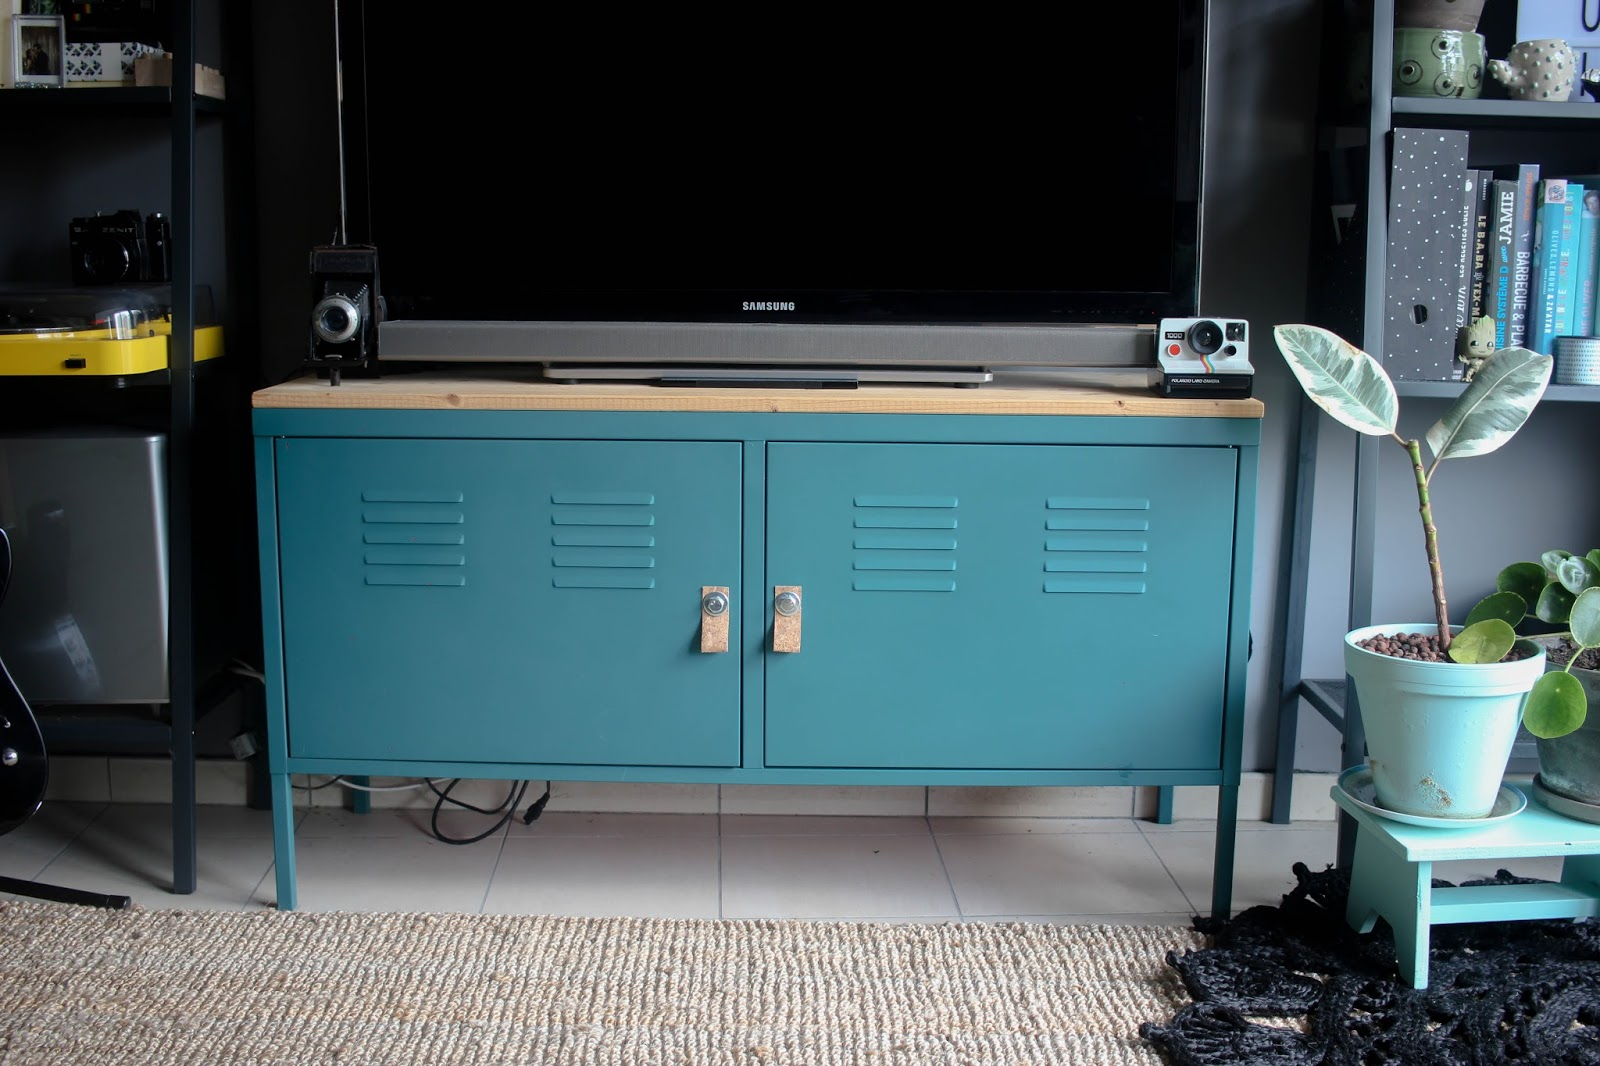 Porte Laque Blanc Ikea meubles ikea france sas | concept d ikea meuble pax ikea